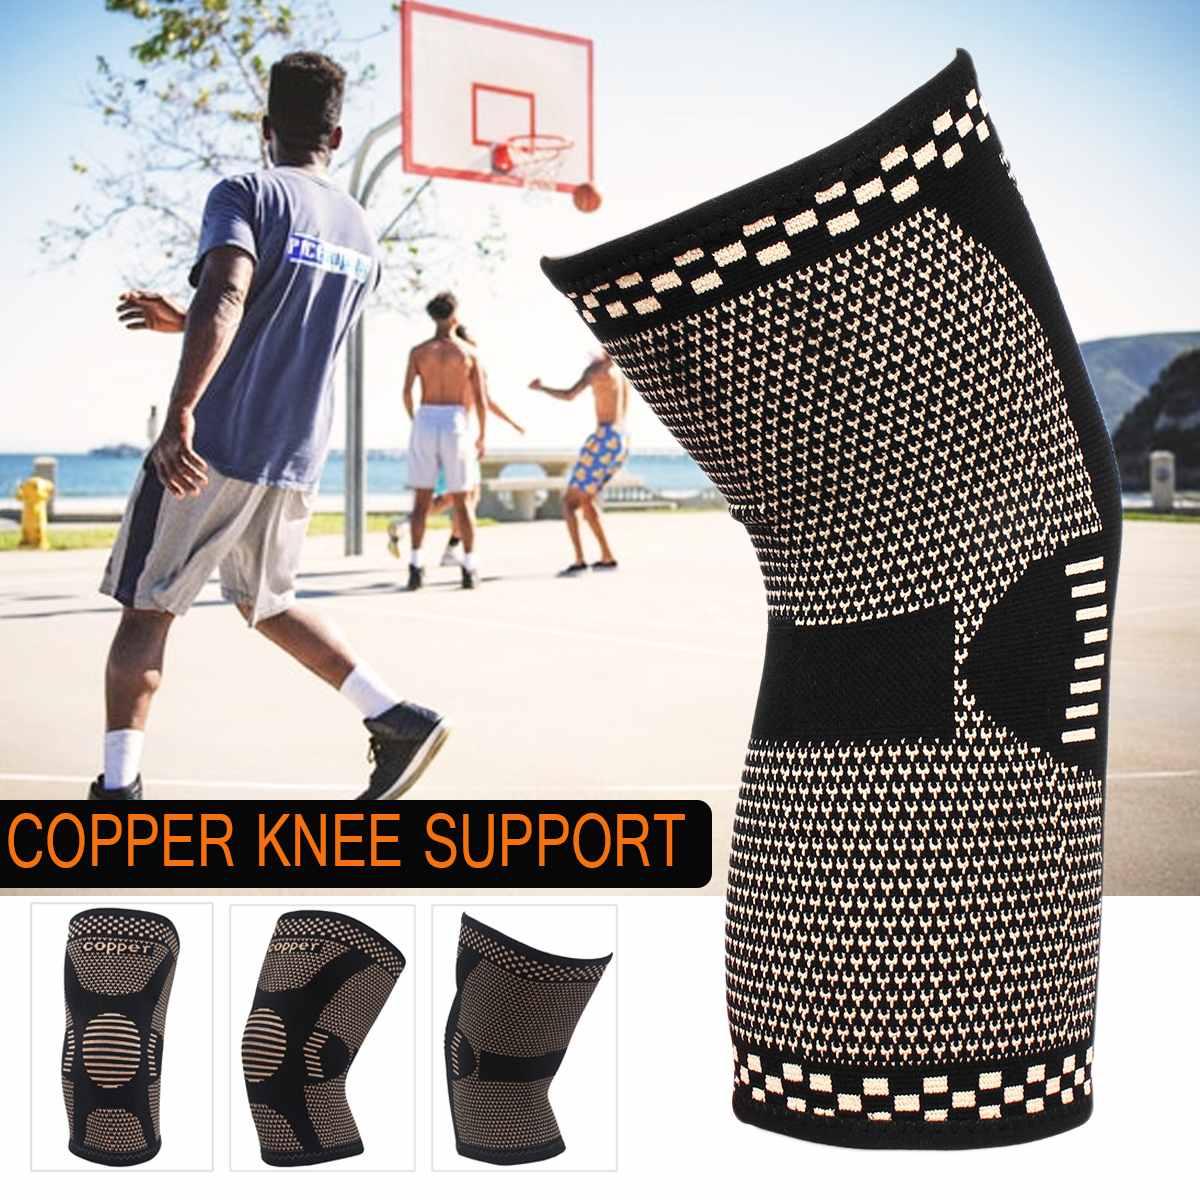 1 ud. Rodillera de cobre, rodillera para artritis, lesión, compresión de pierna